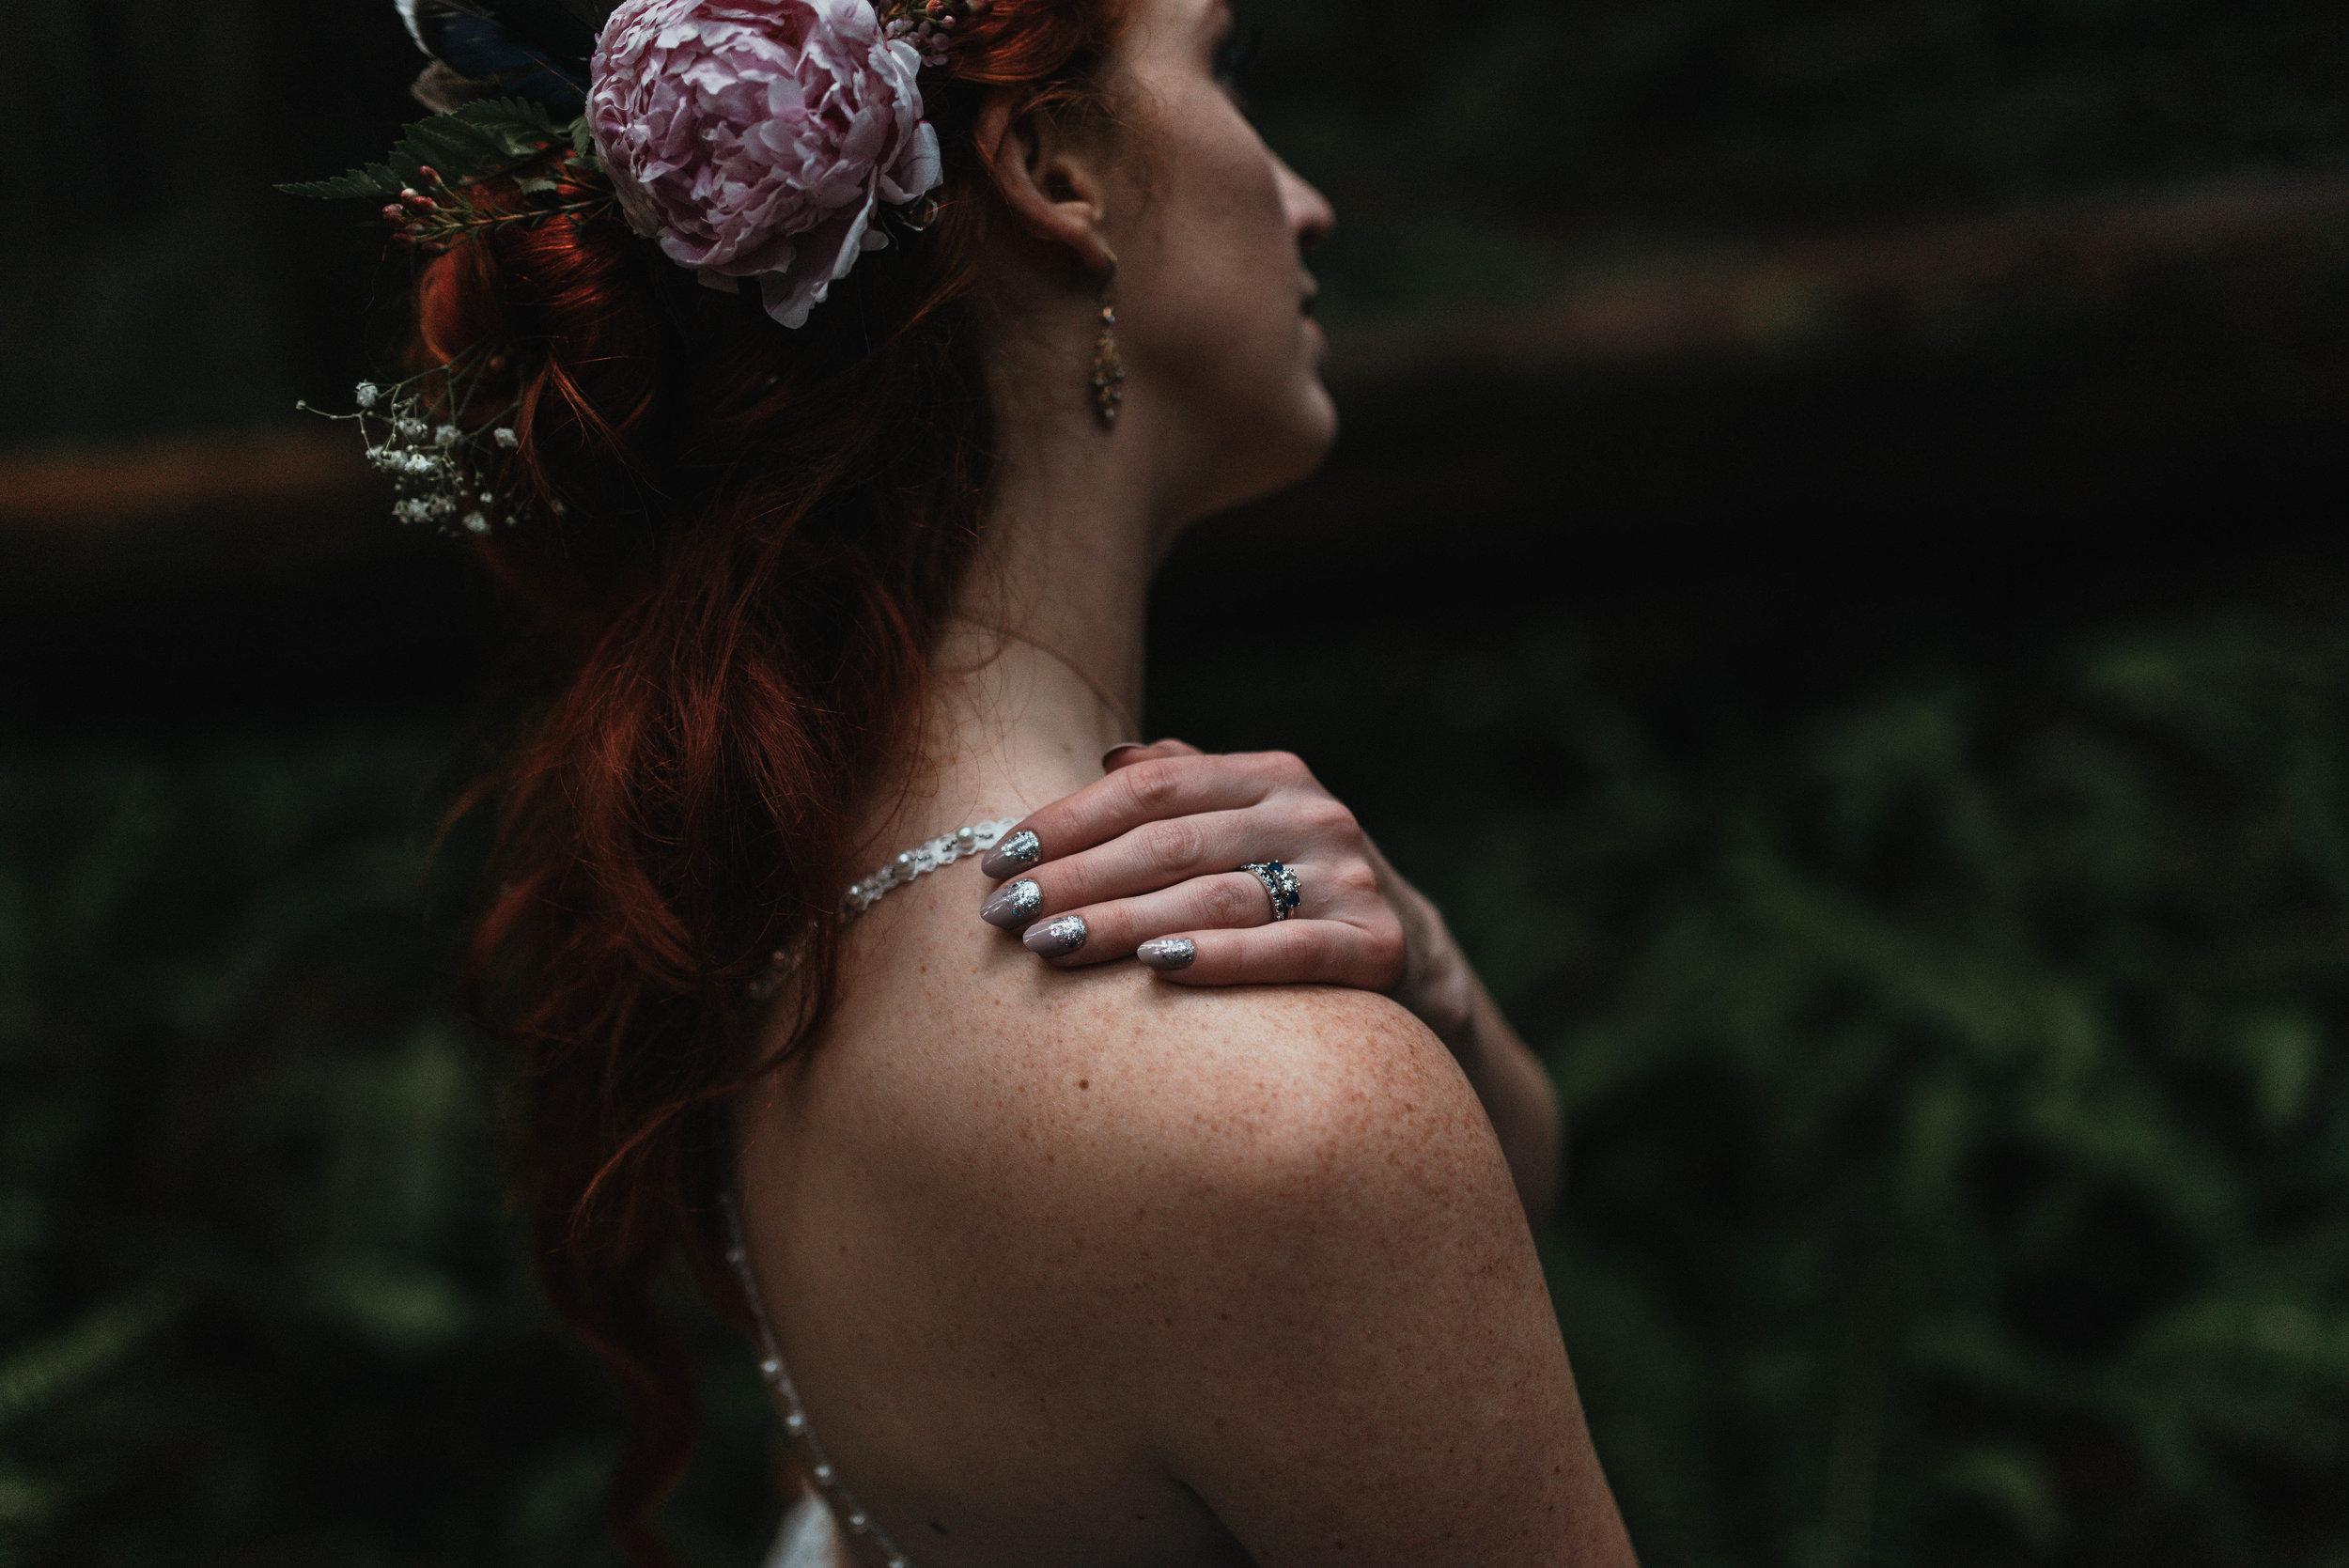 Intimiate Redwoods Elopement , Elopement Inspiration, Jessica Heron Images, Northern California Elopement, Oregon Elopement, Oregon Wedding, Elopement Ideas, diy dress, flower hair